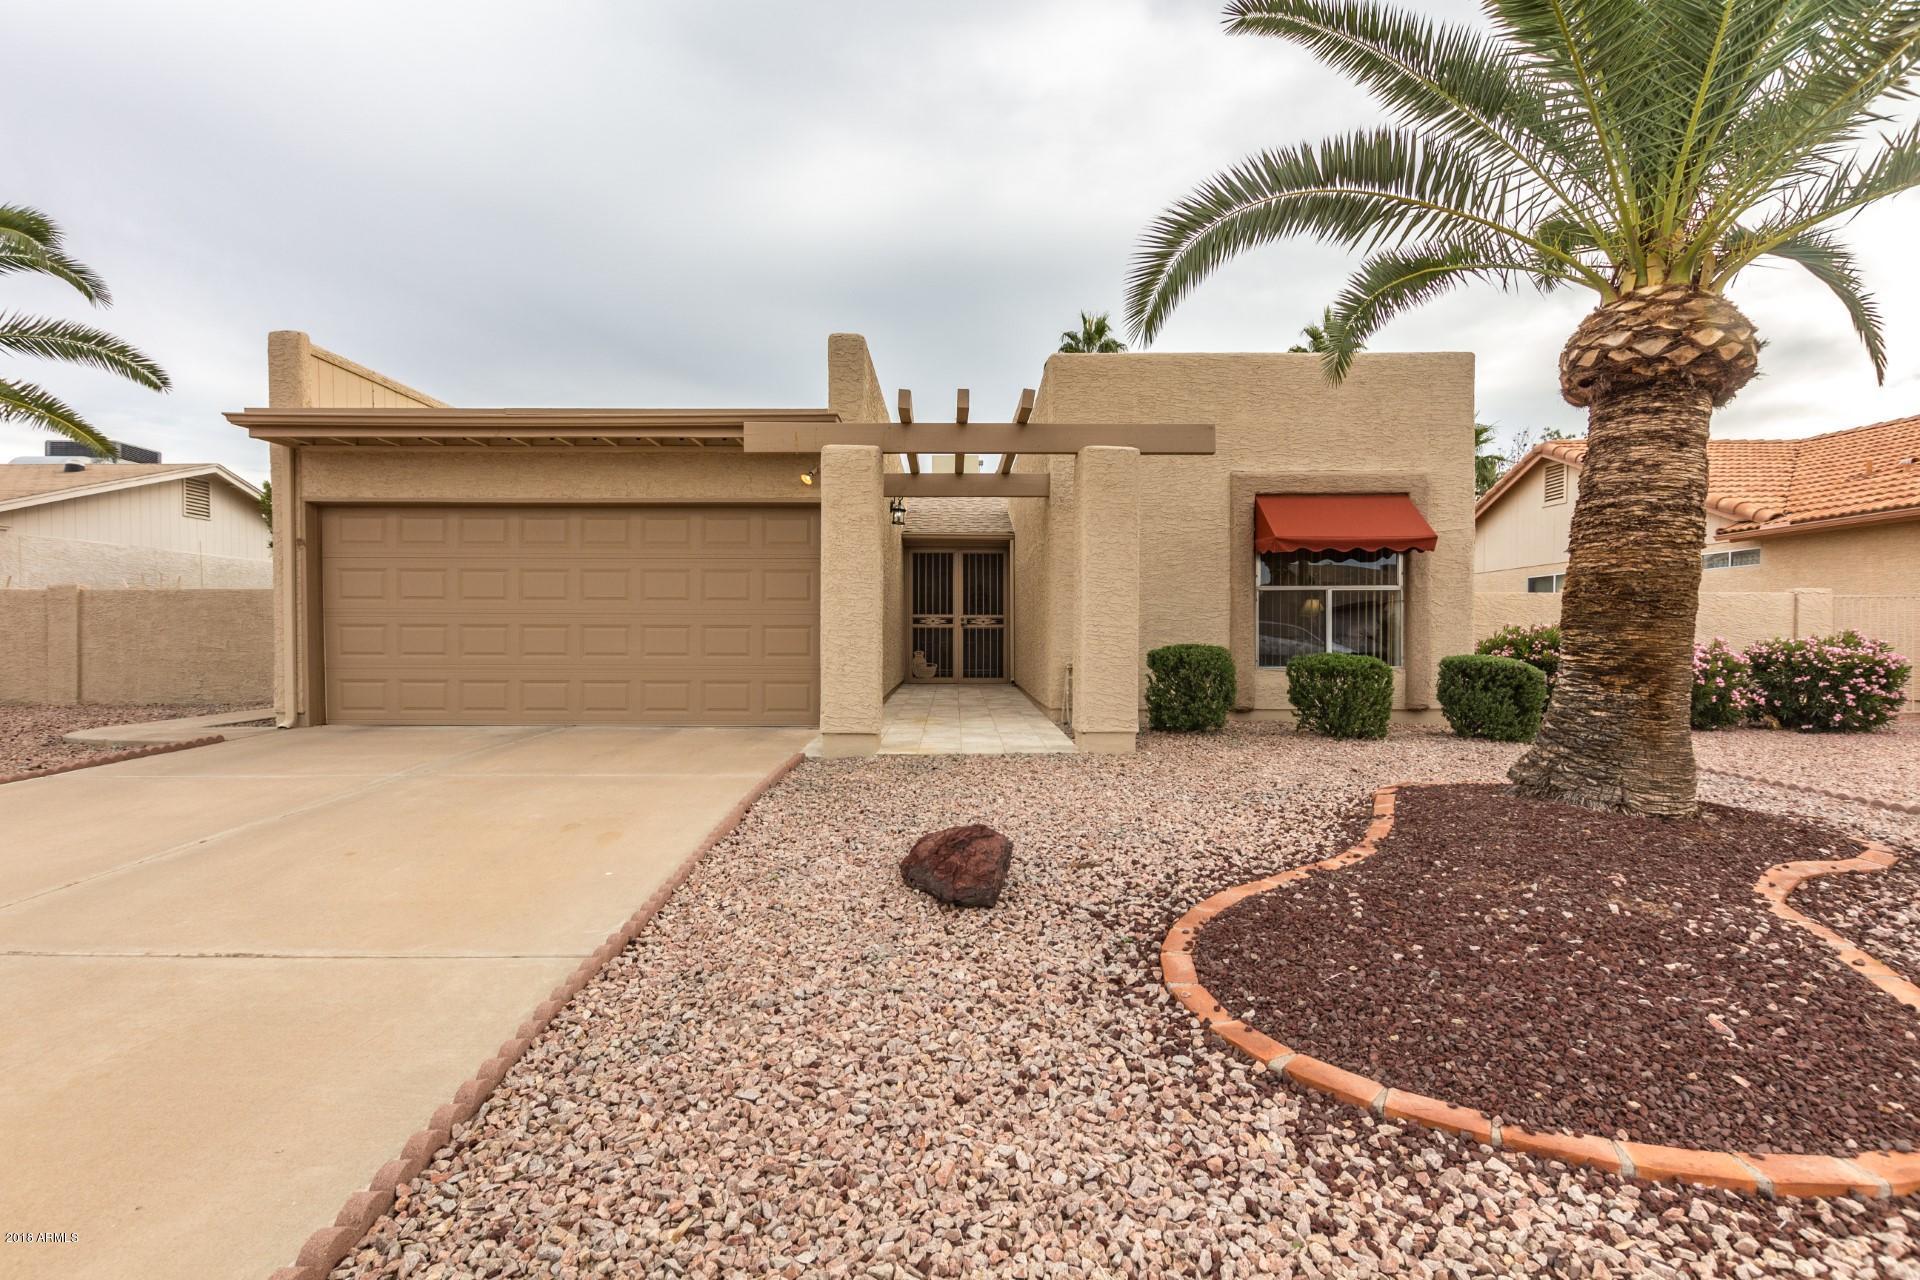 Photo for 26613 S Truro Drive, Sun Lakes, AZ 85248 (MLS # 5847350)